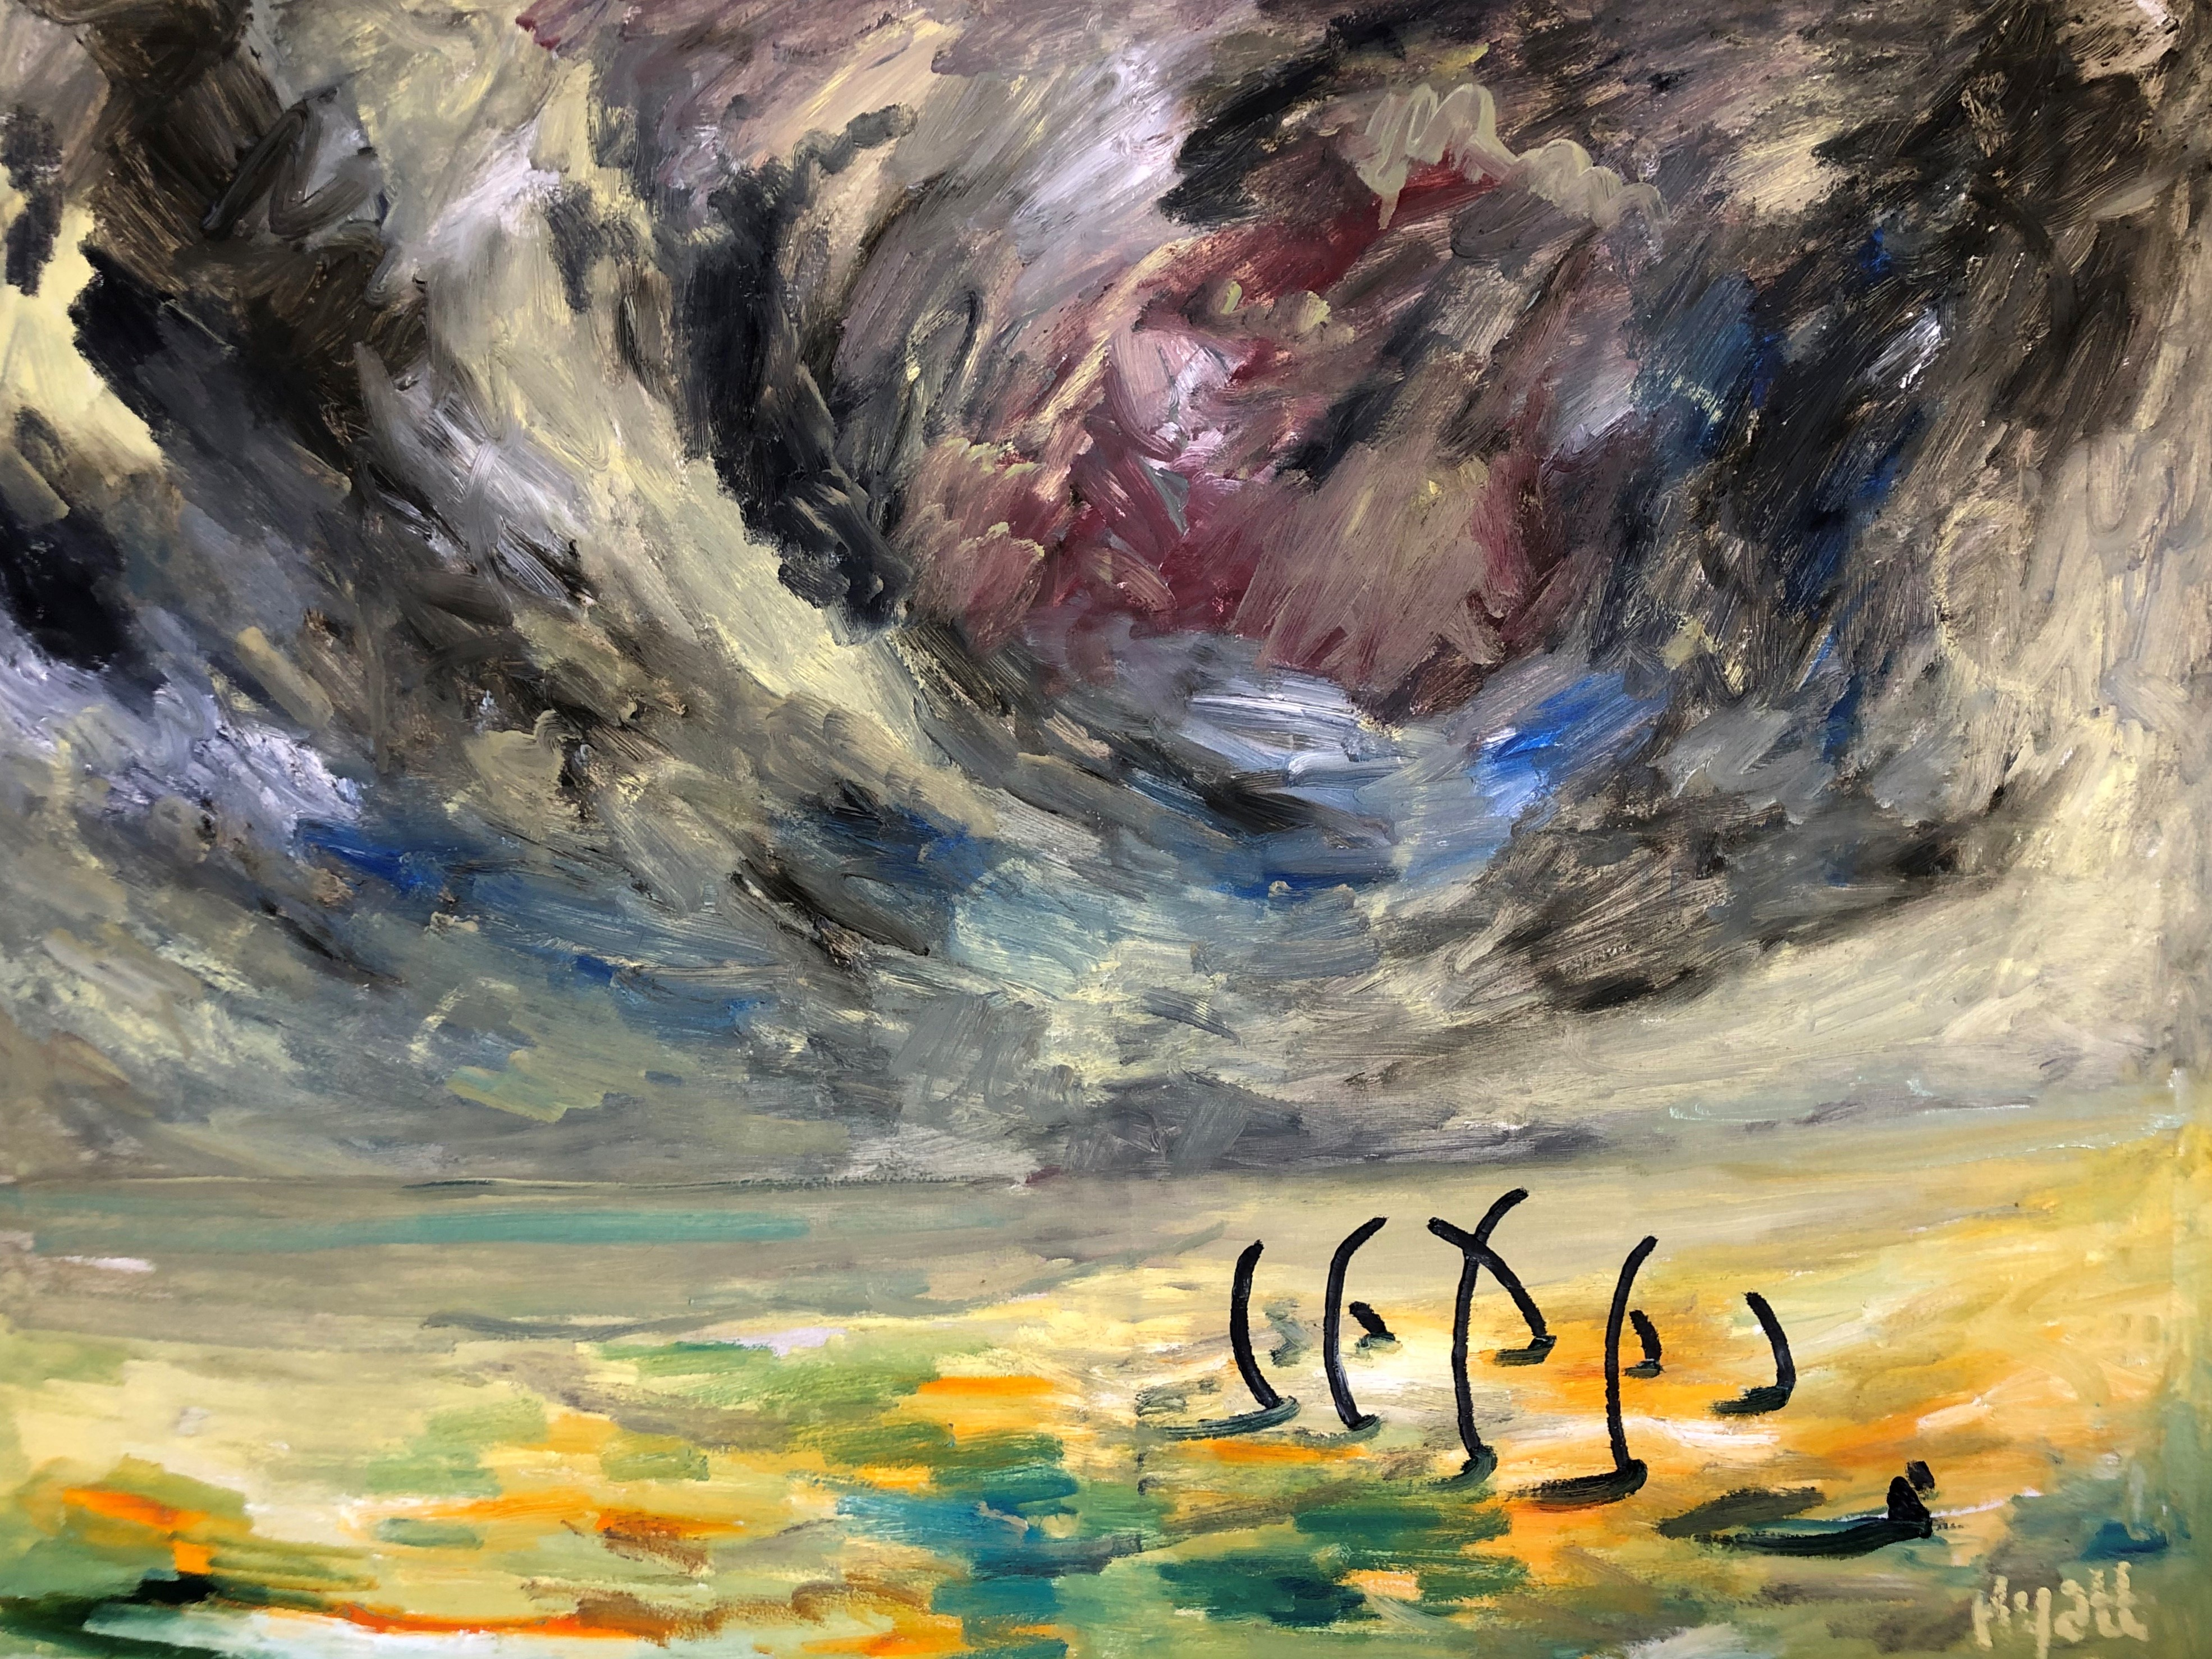 The Cube: Sea, Air and Wrecks: New Paintings by John Hyatt